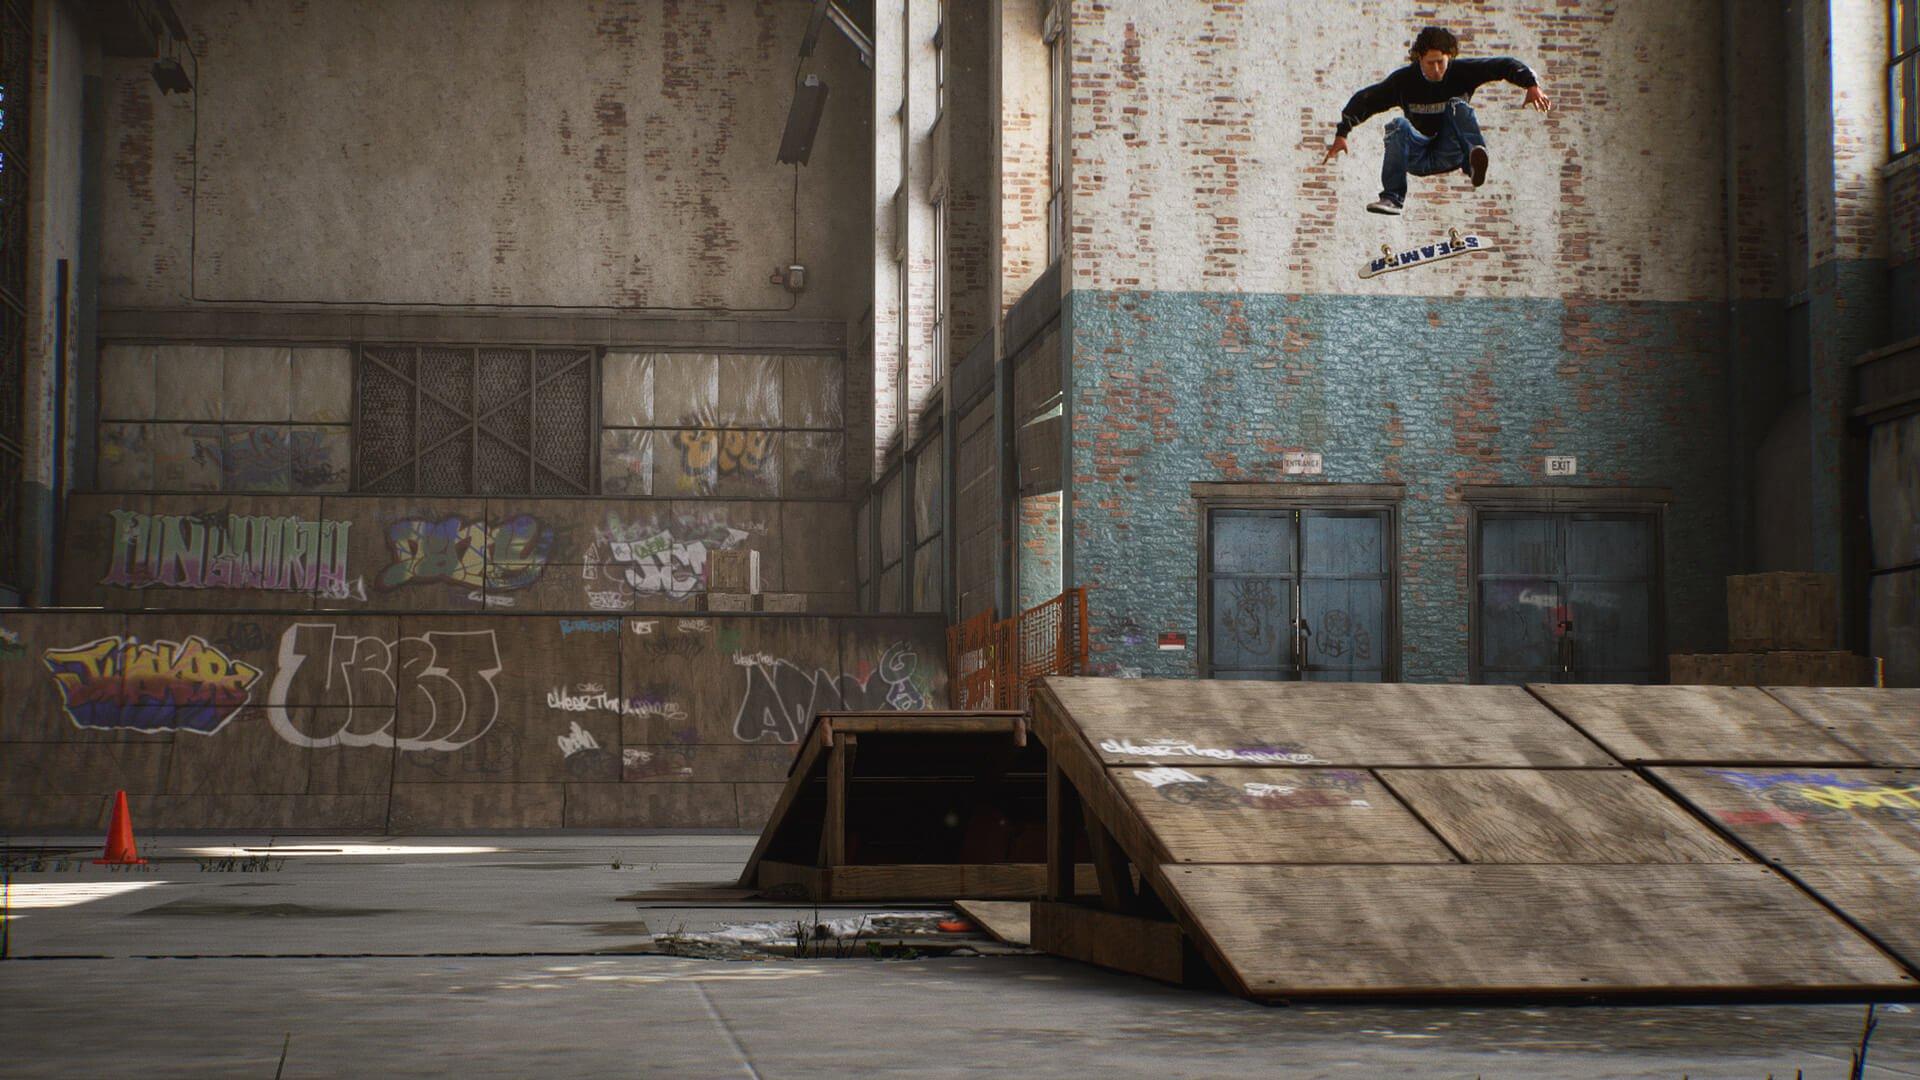 How to AirWalk in Tony Hawk's Pro Skater 1 + 2